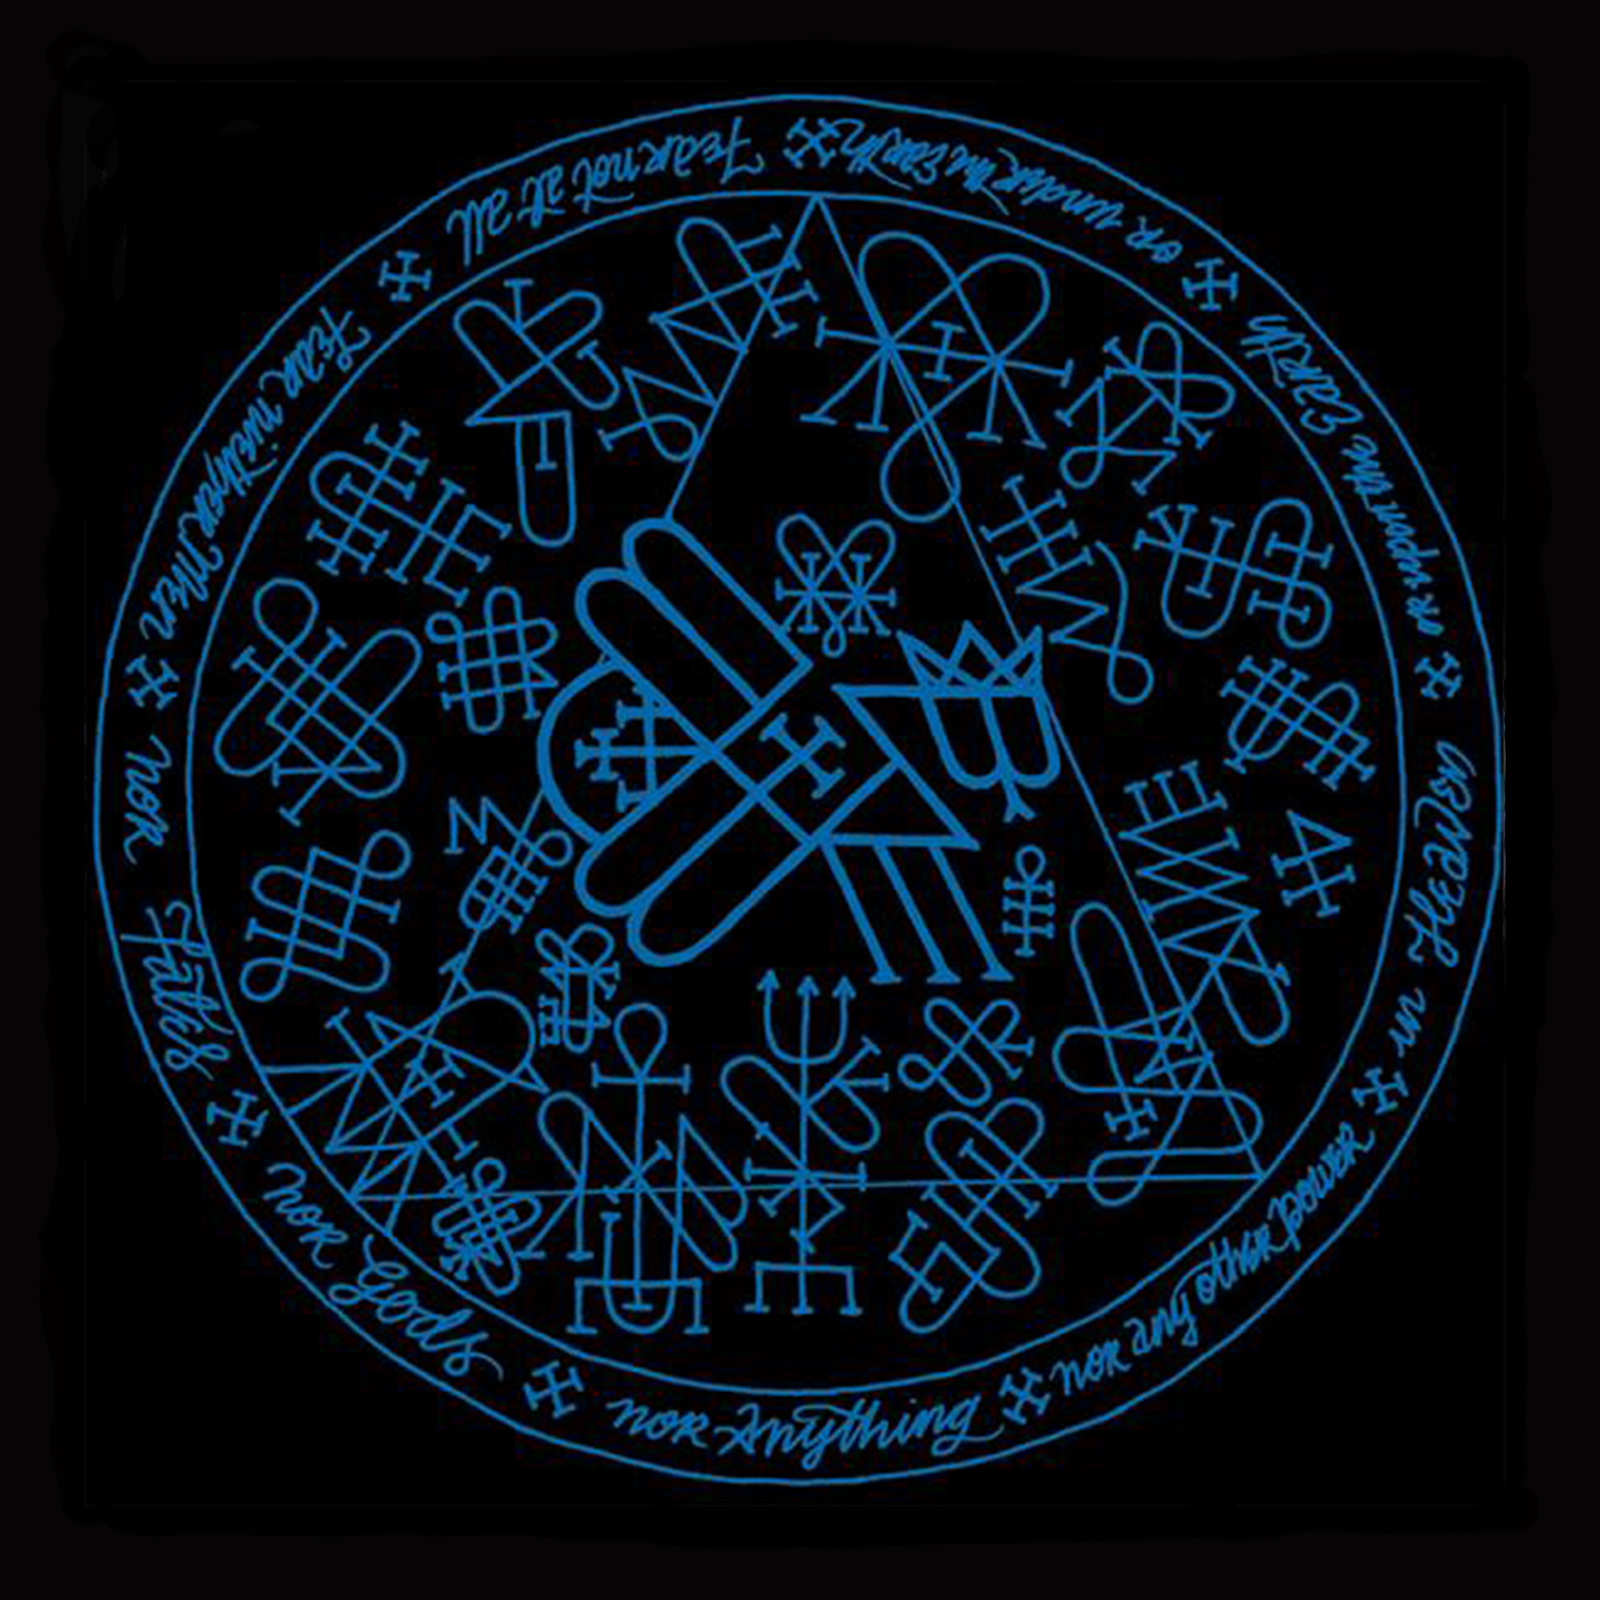 LEGION 49 BEELZEBUB: Circle of Conjuration